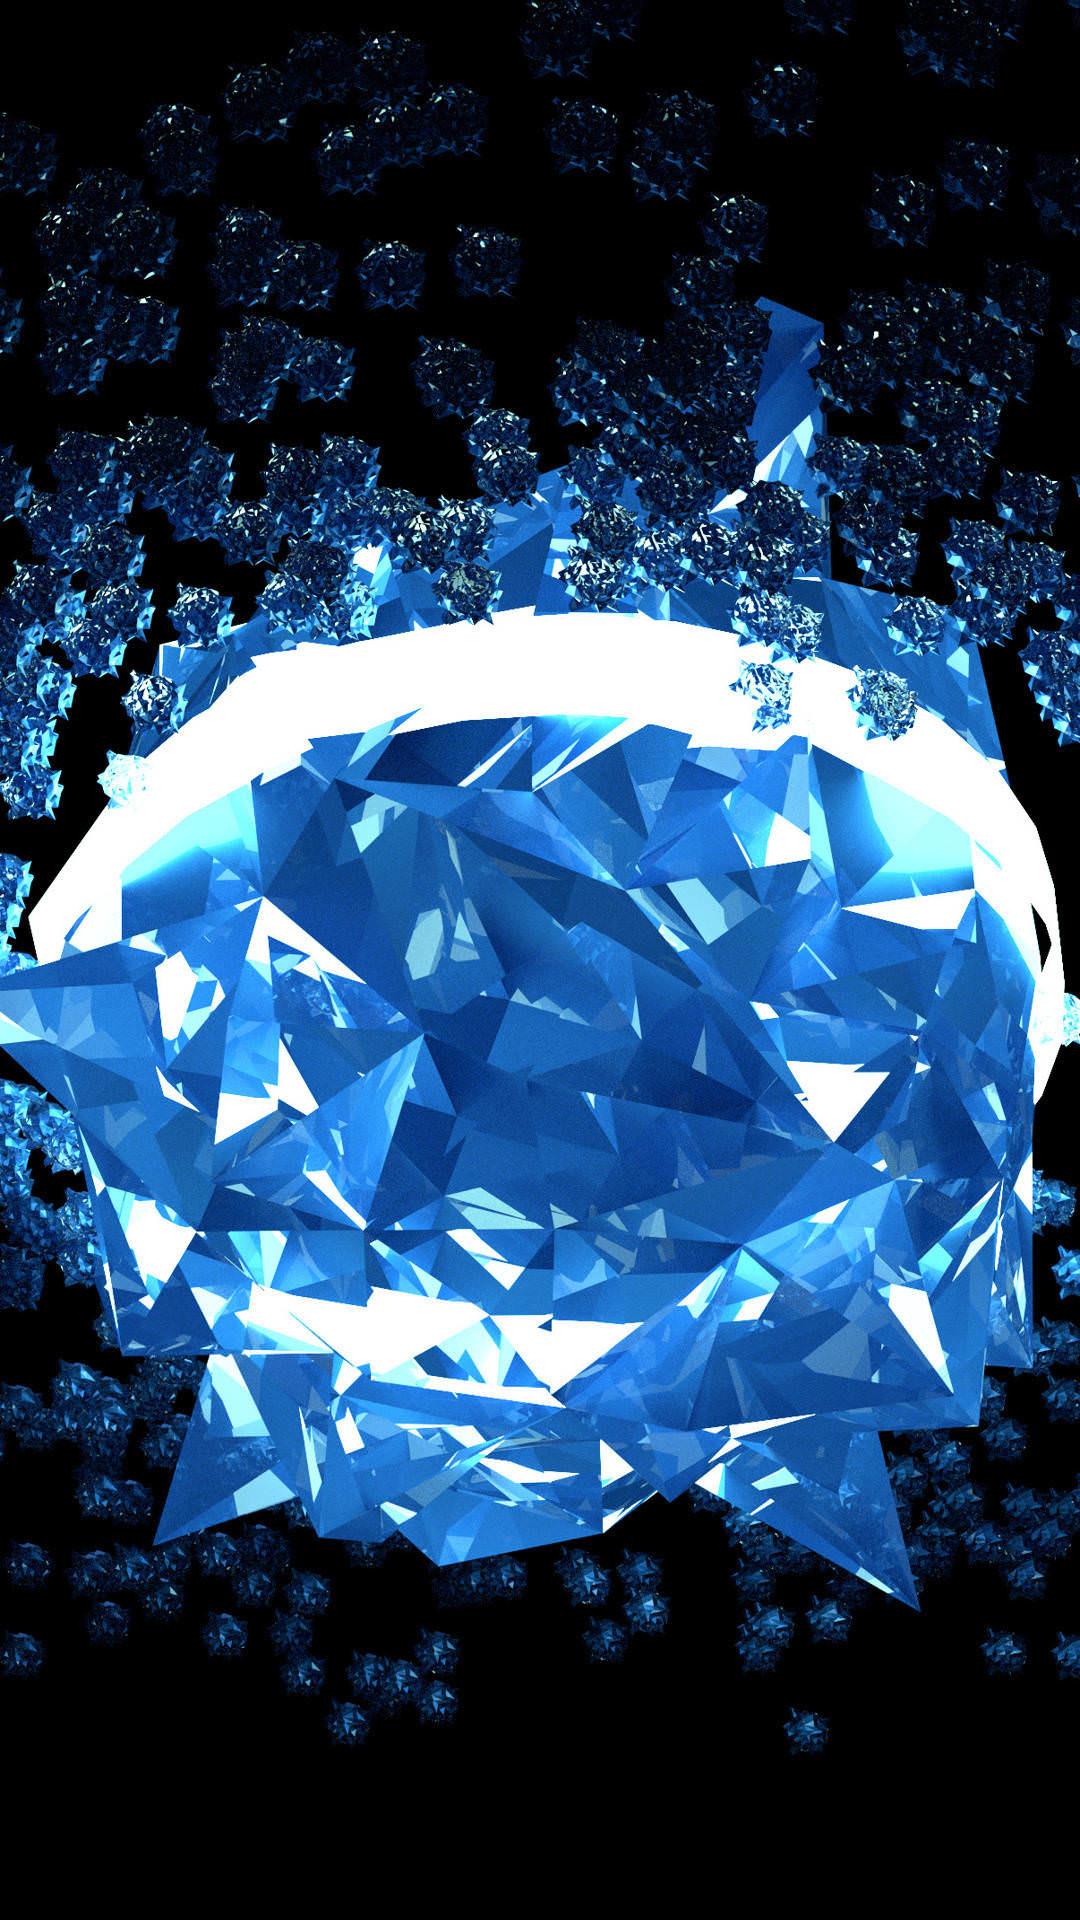 Res: 1080x1920, Blue Crystal Diamond Wallpaper